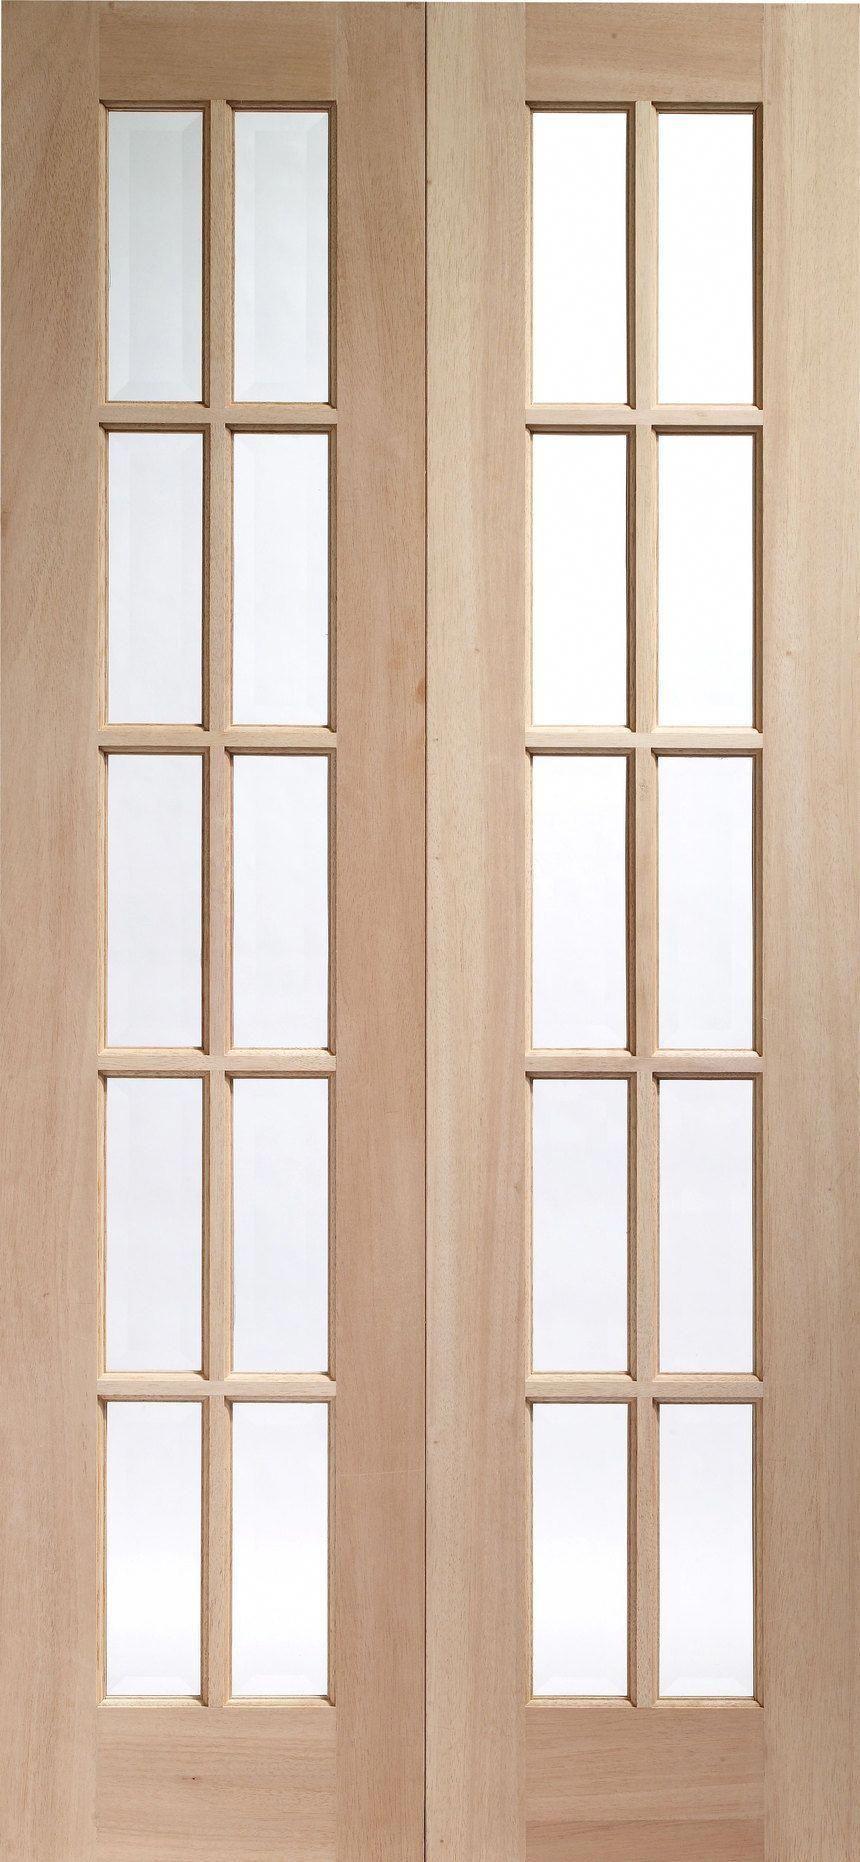 Decorative interior doors interior double french doors prehung cost of french doors 20181122